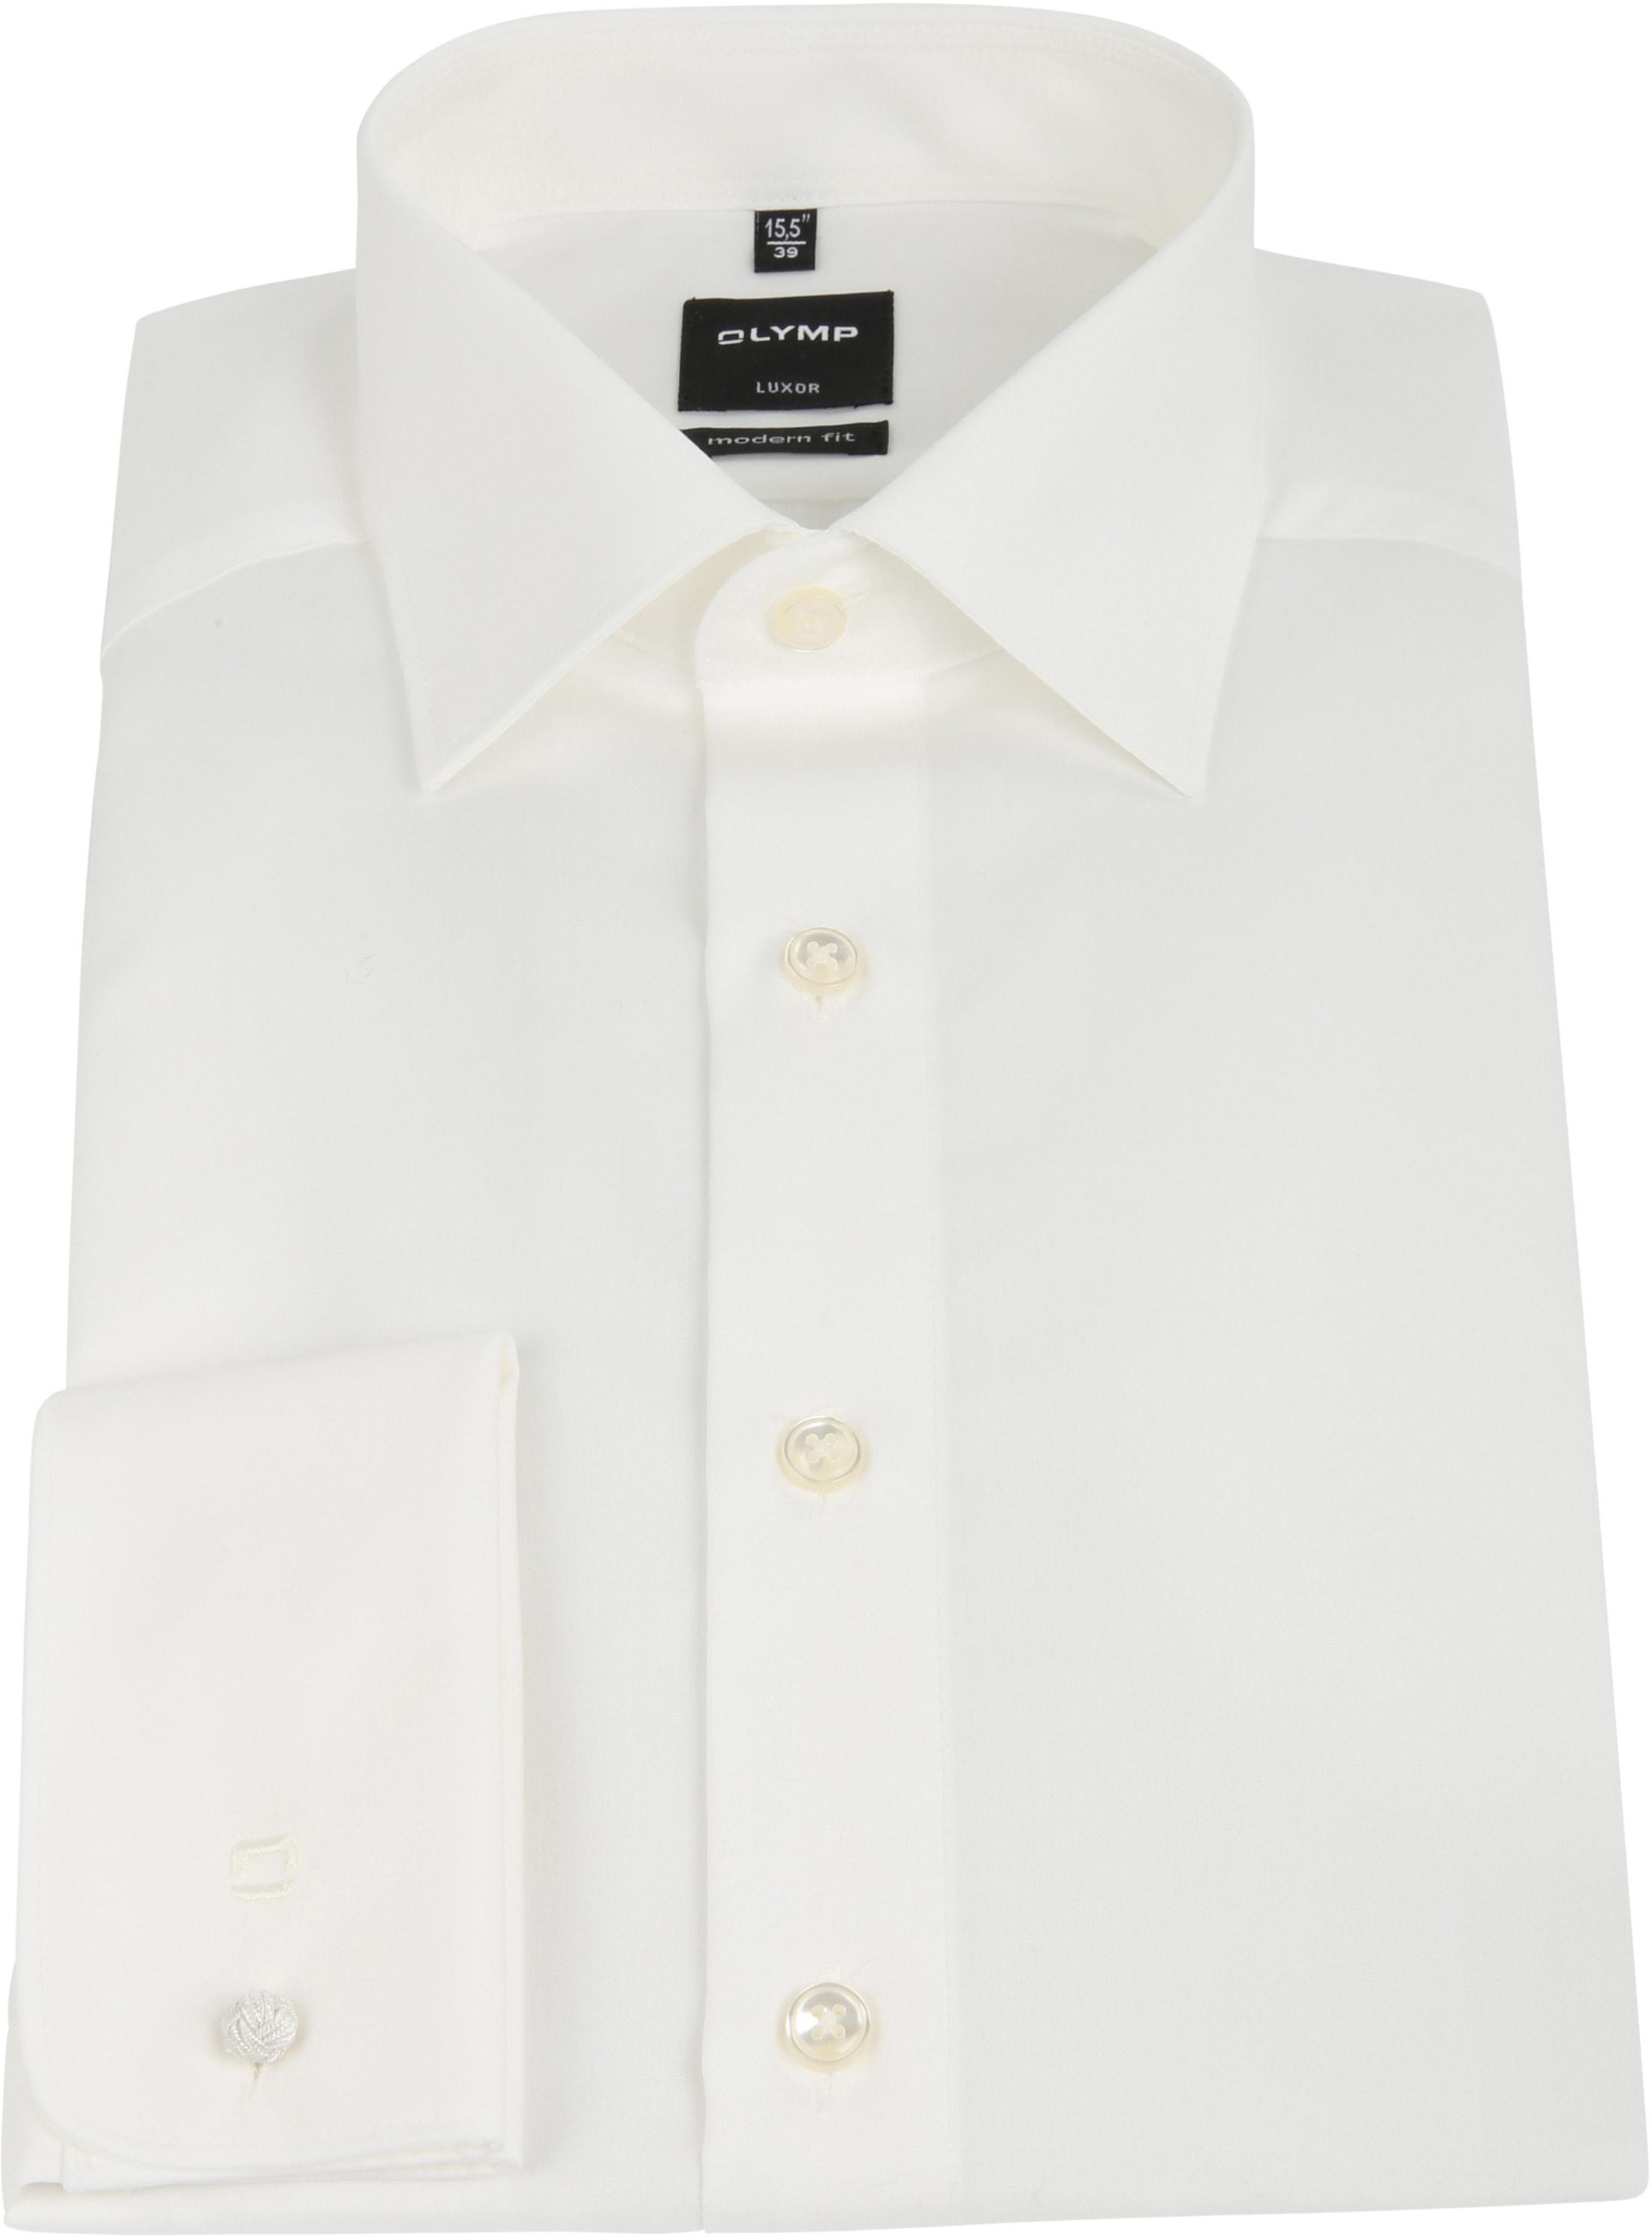 Olymp Luxor Shirt Double Cuff Ecru